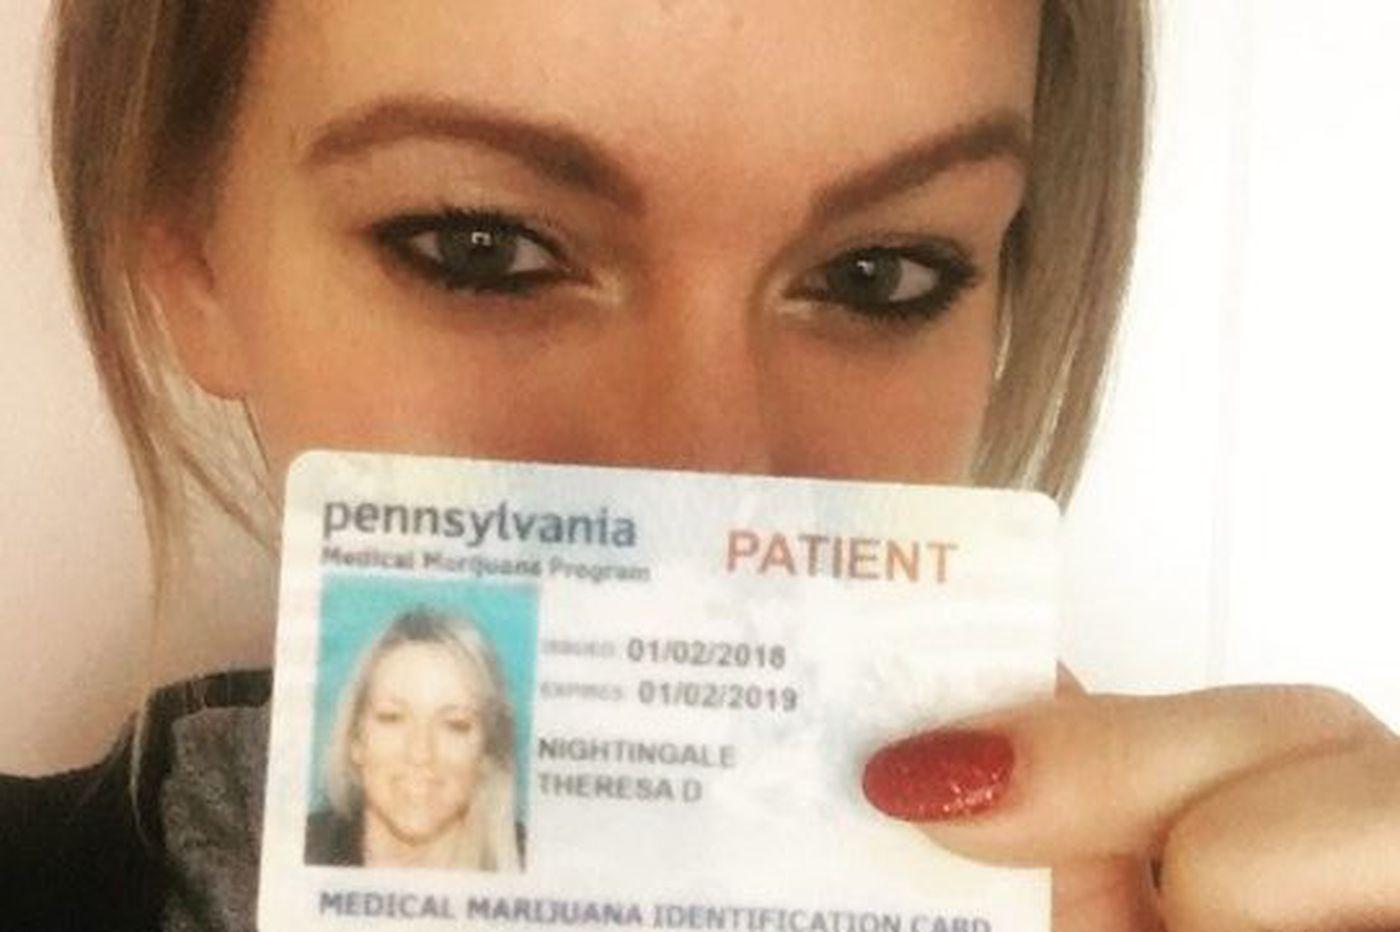 Patients must choose: Medical marijuana or gun ownership